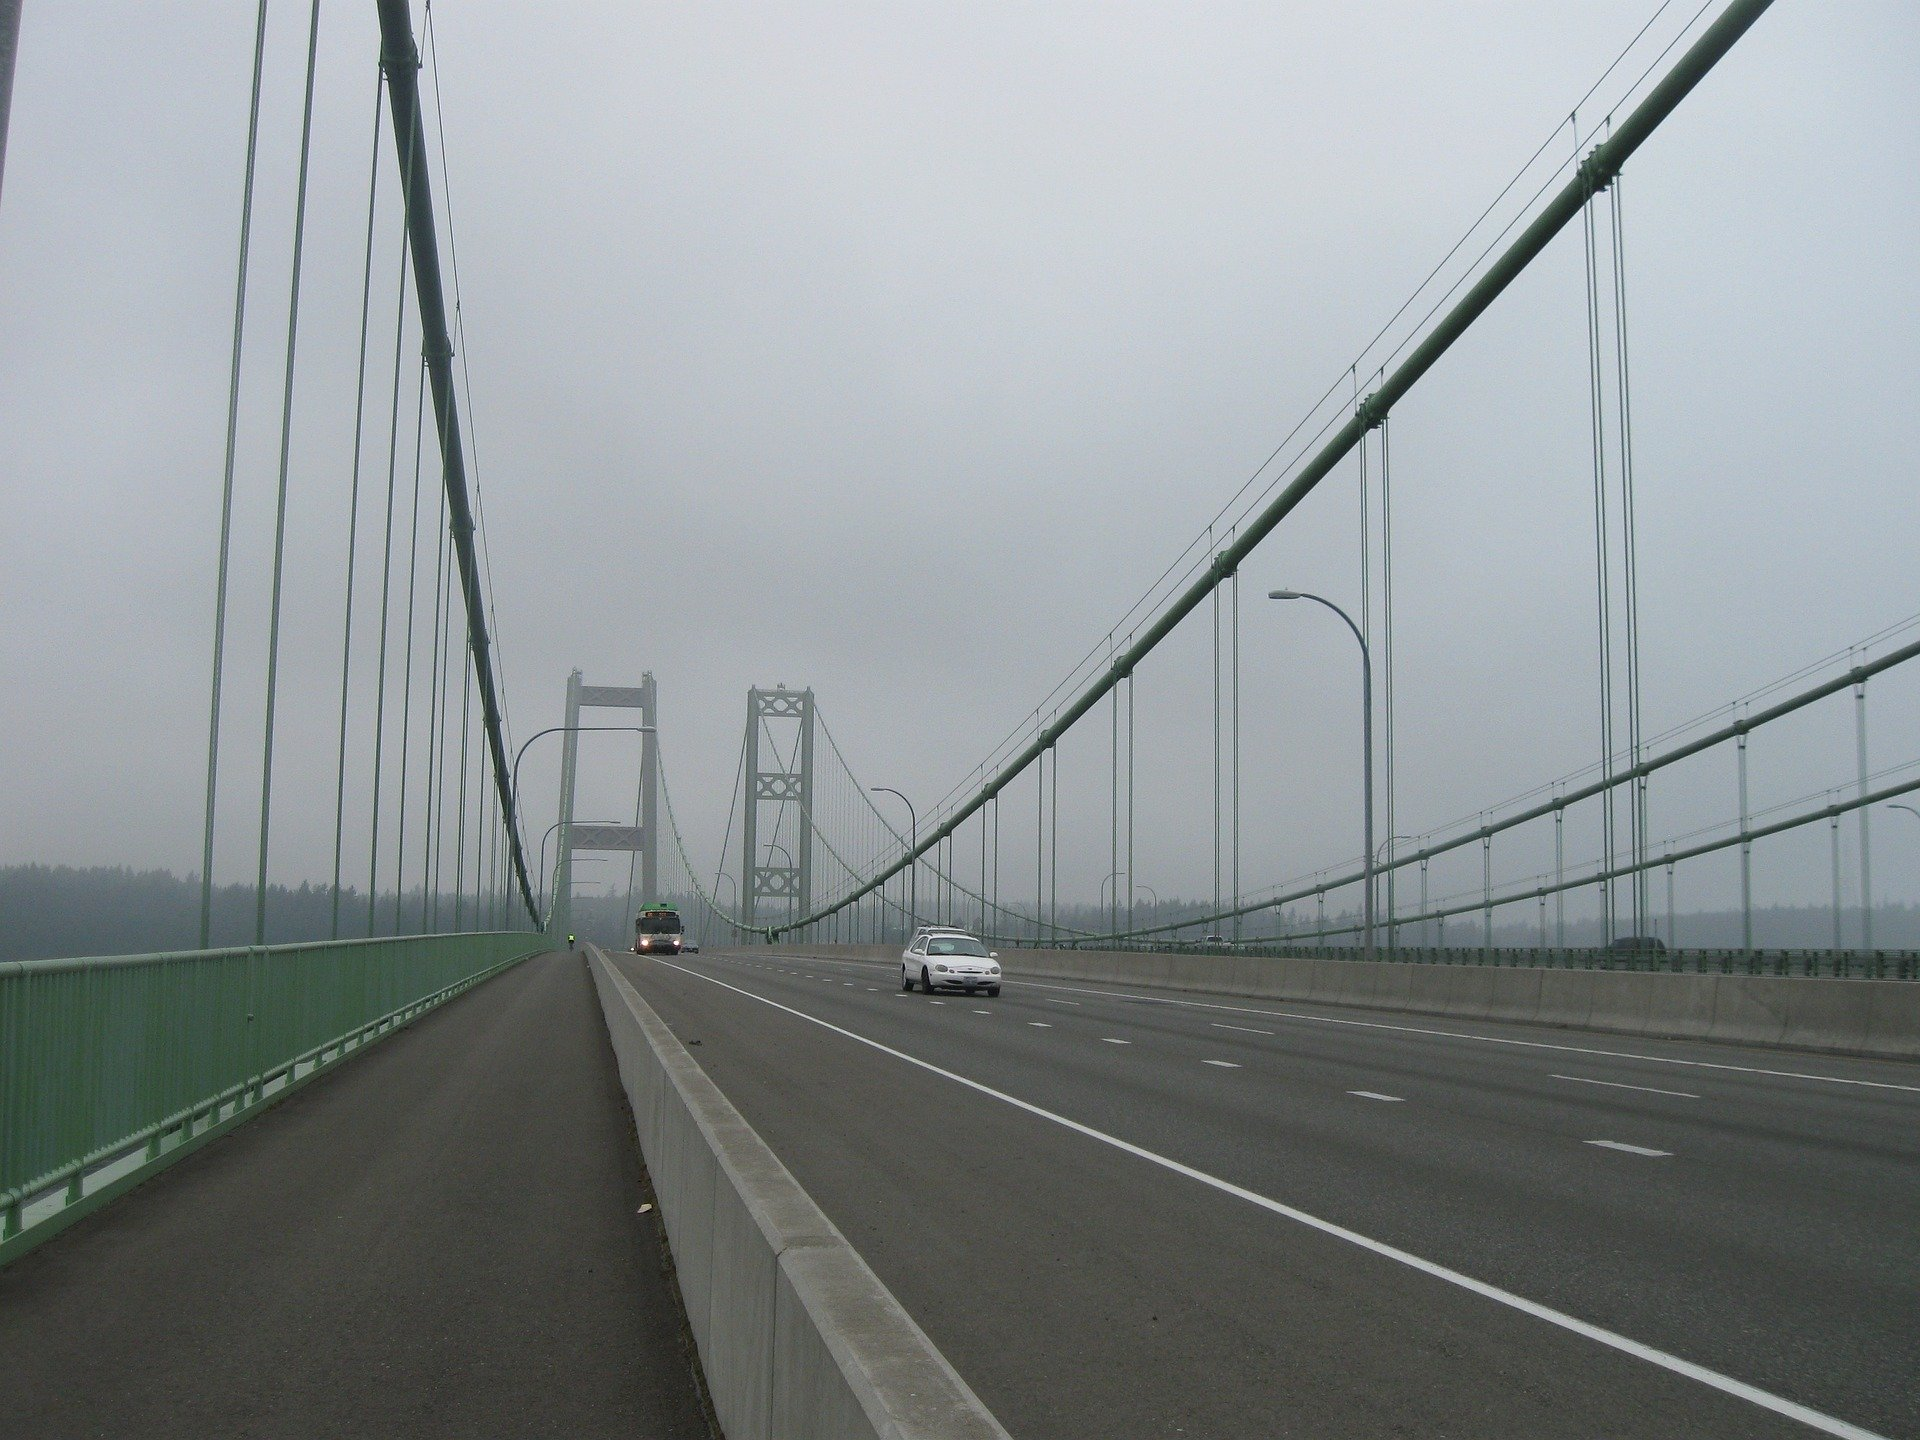 ELR-052 Ethics Case Study Tacoma Narrows Bridge